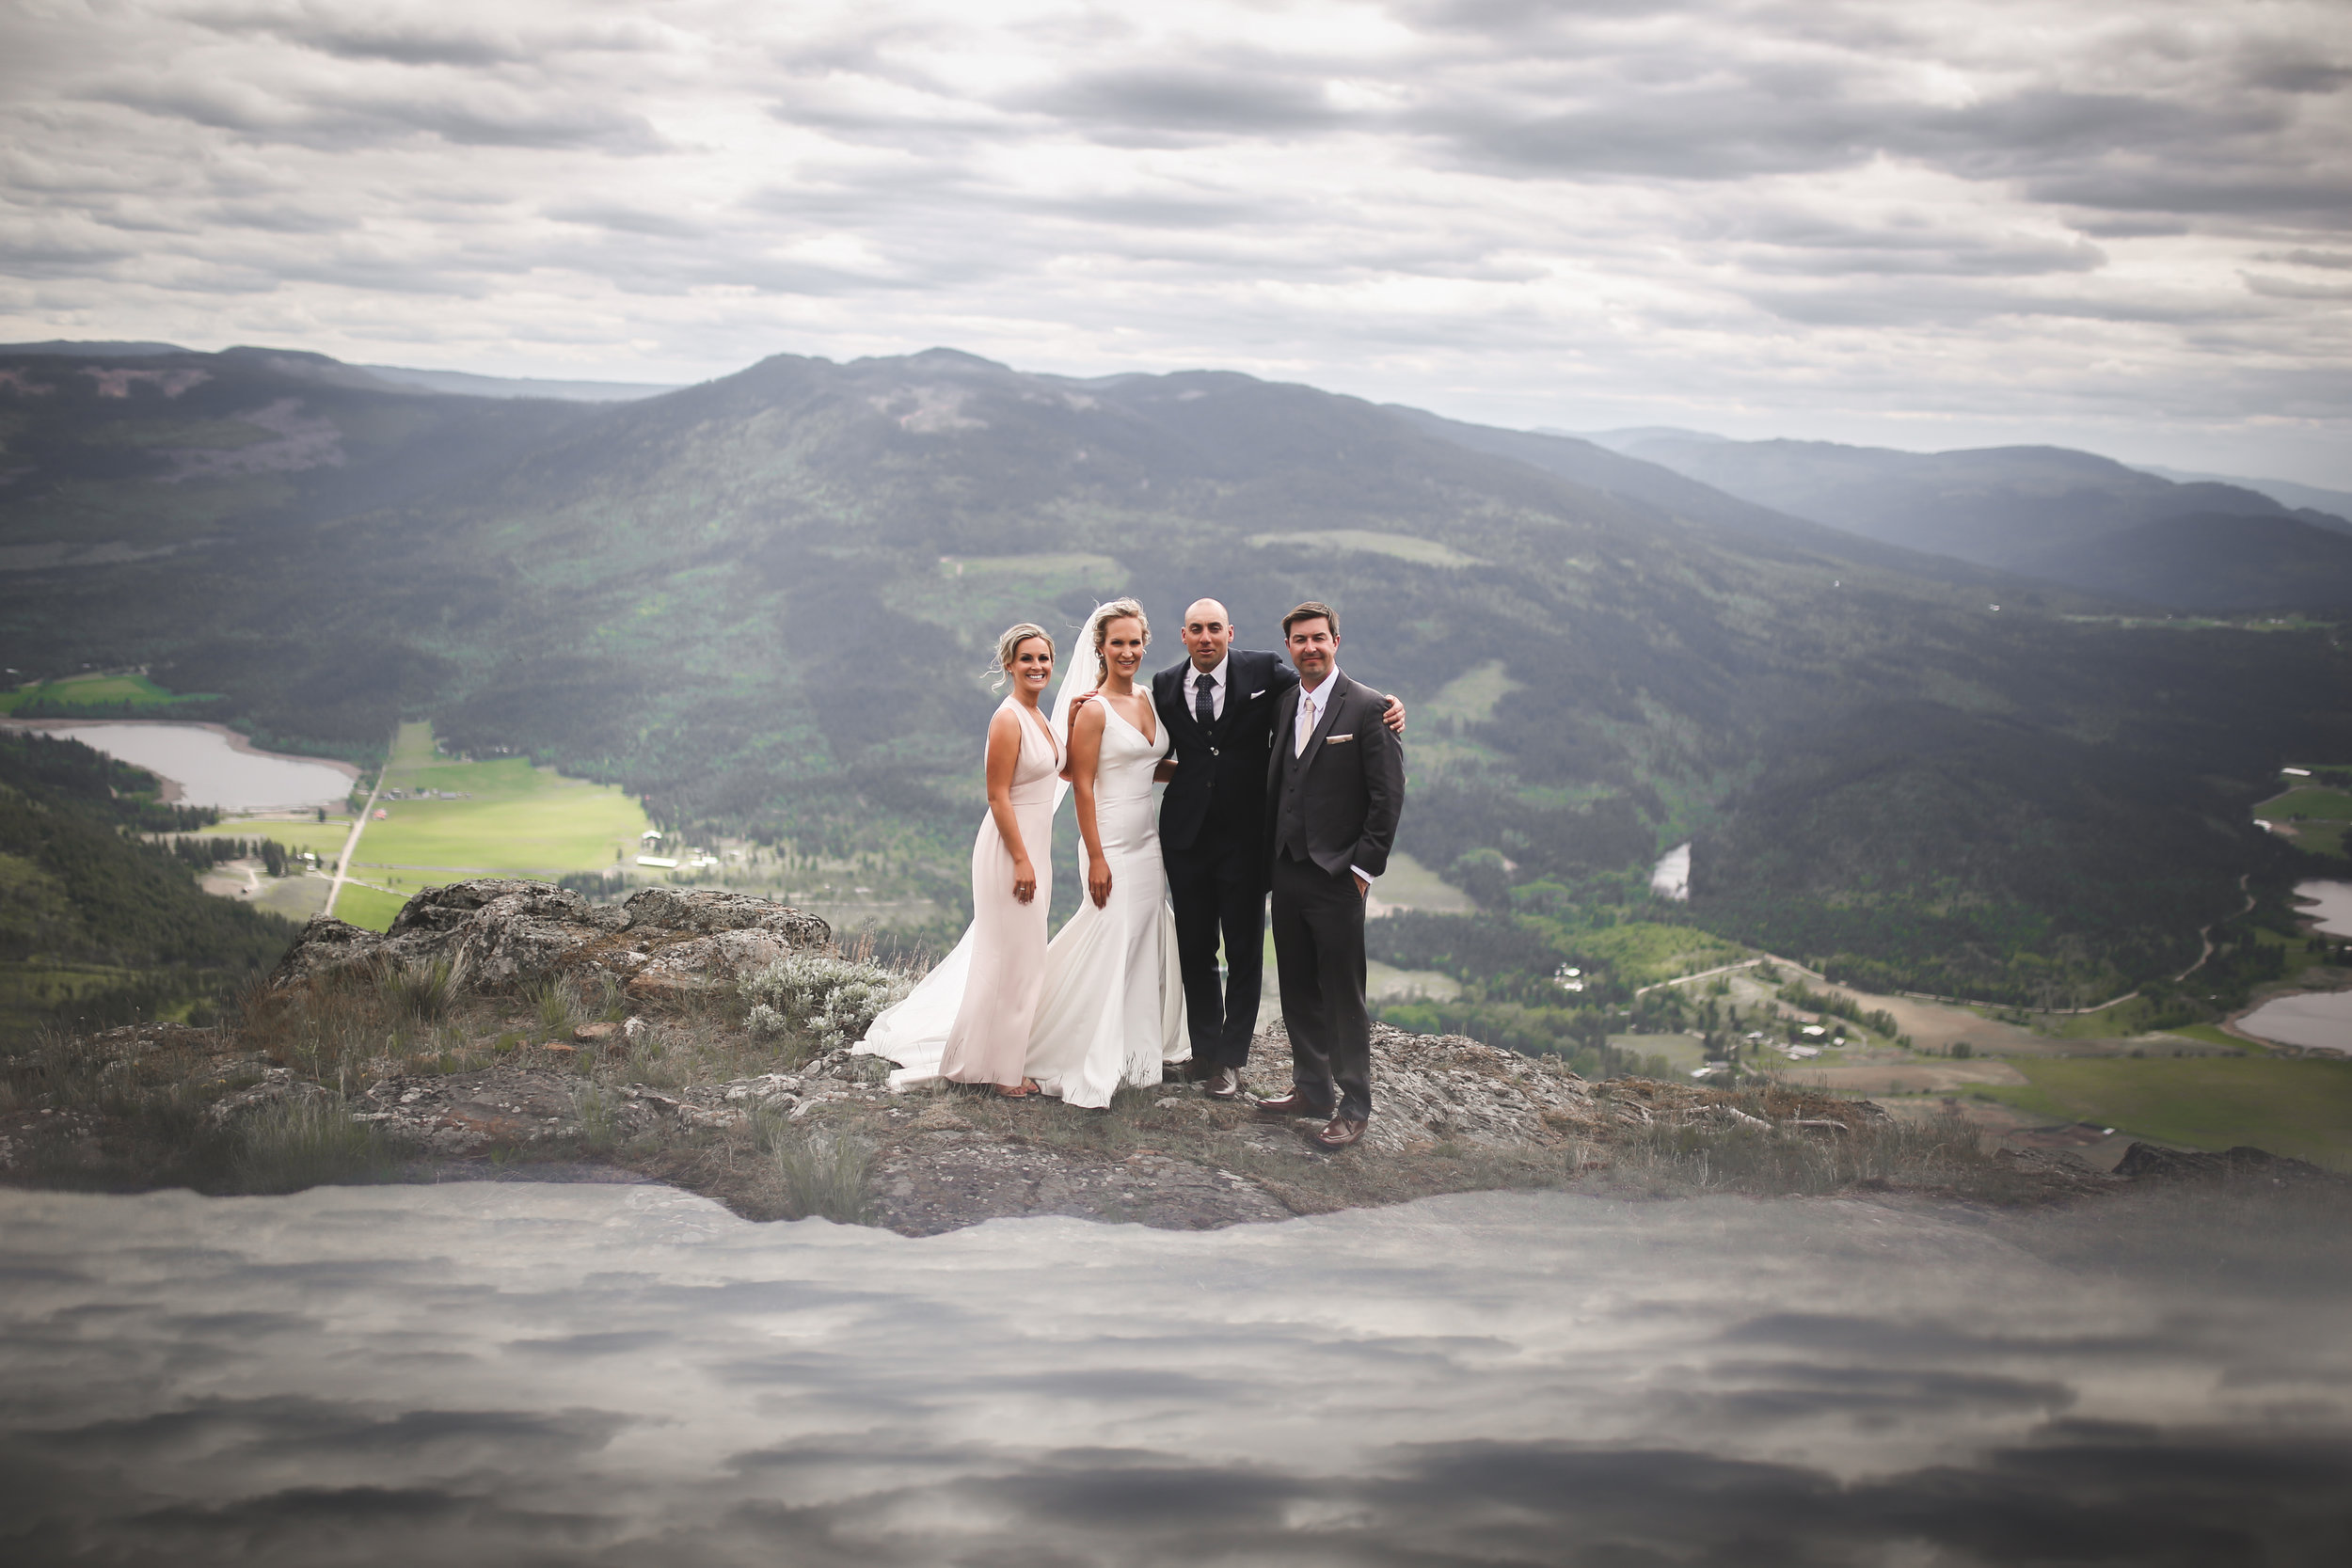 168 Adam Ziorio Photography - Kate & Ben's Wedding.jpg